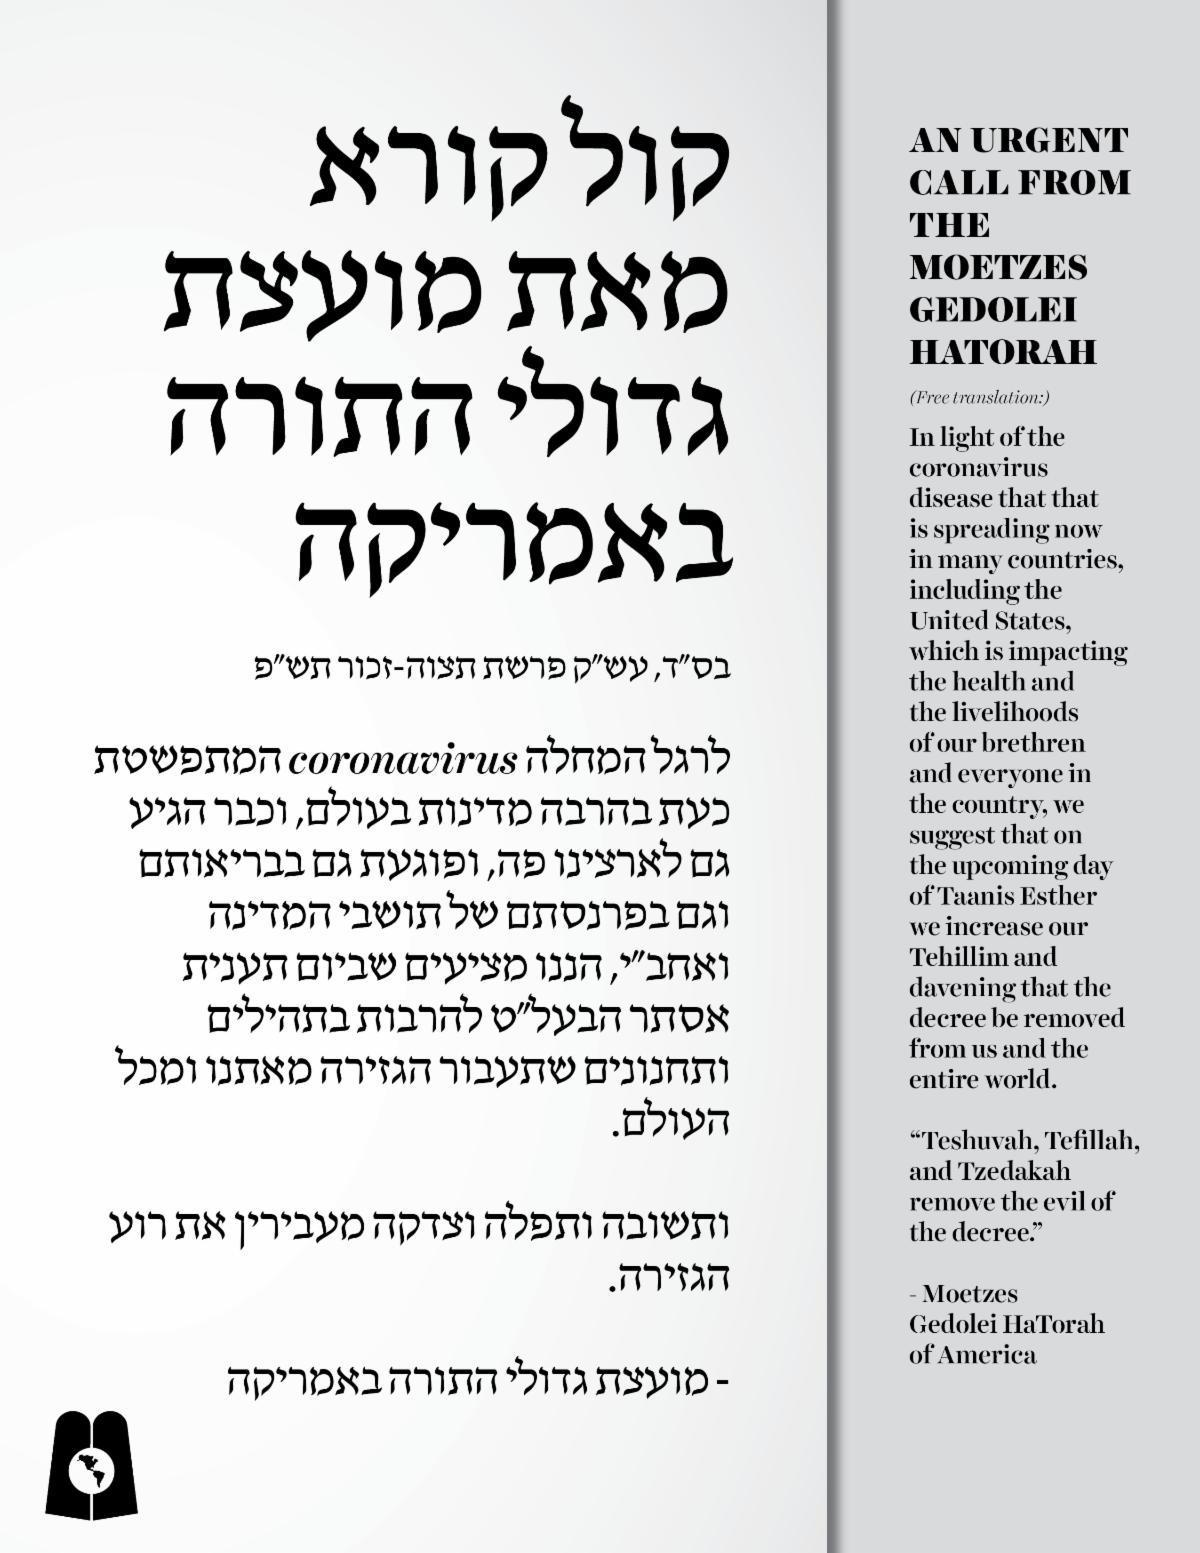 An Urgent Call from the Moetzes Gedolei HaTorah of America 2